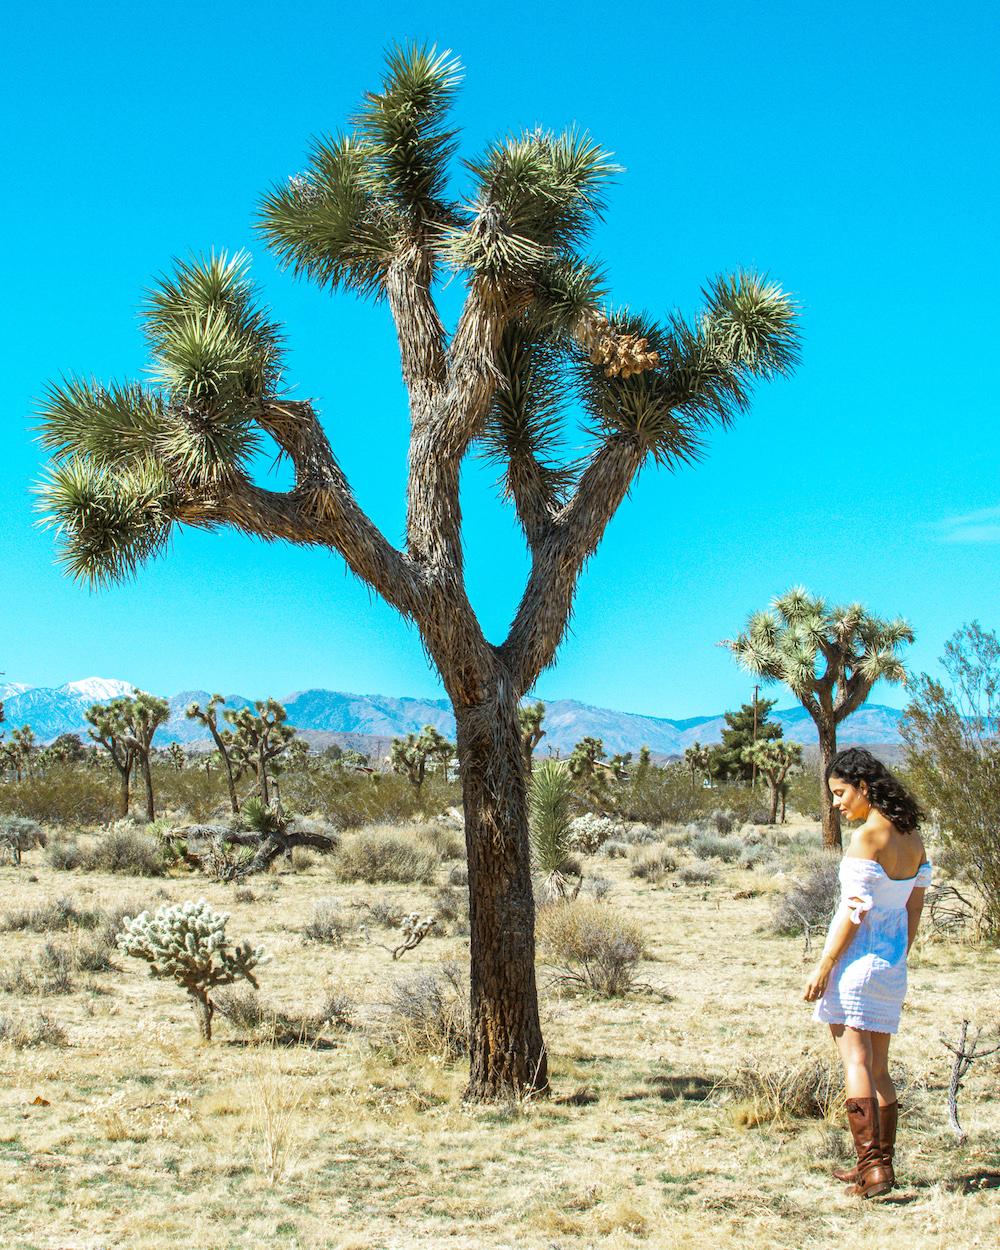 woman at joshua tree yucca plant